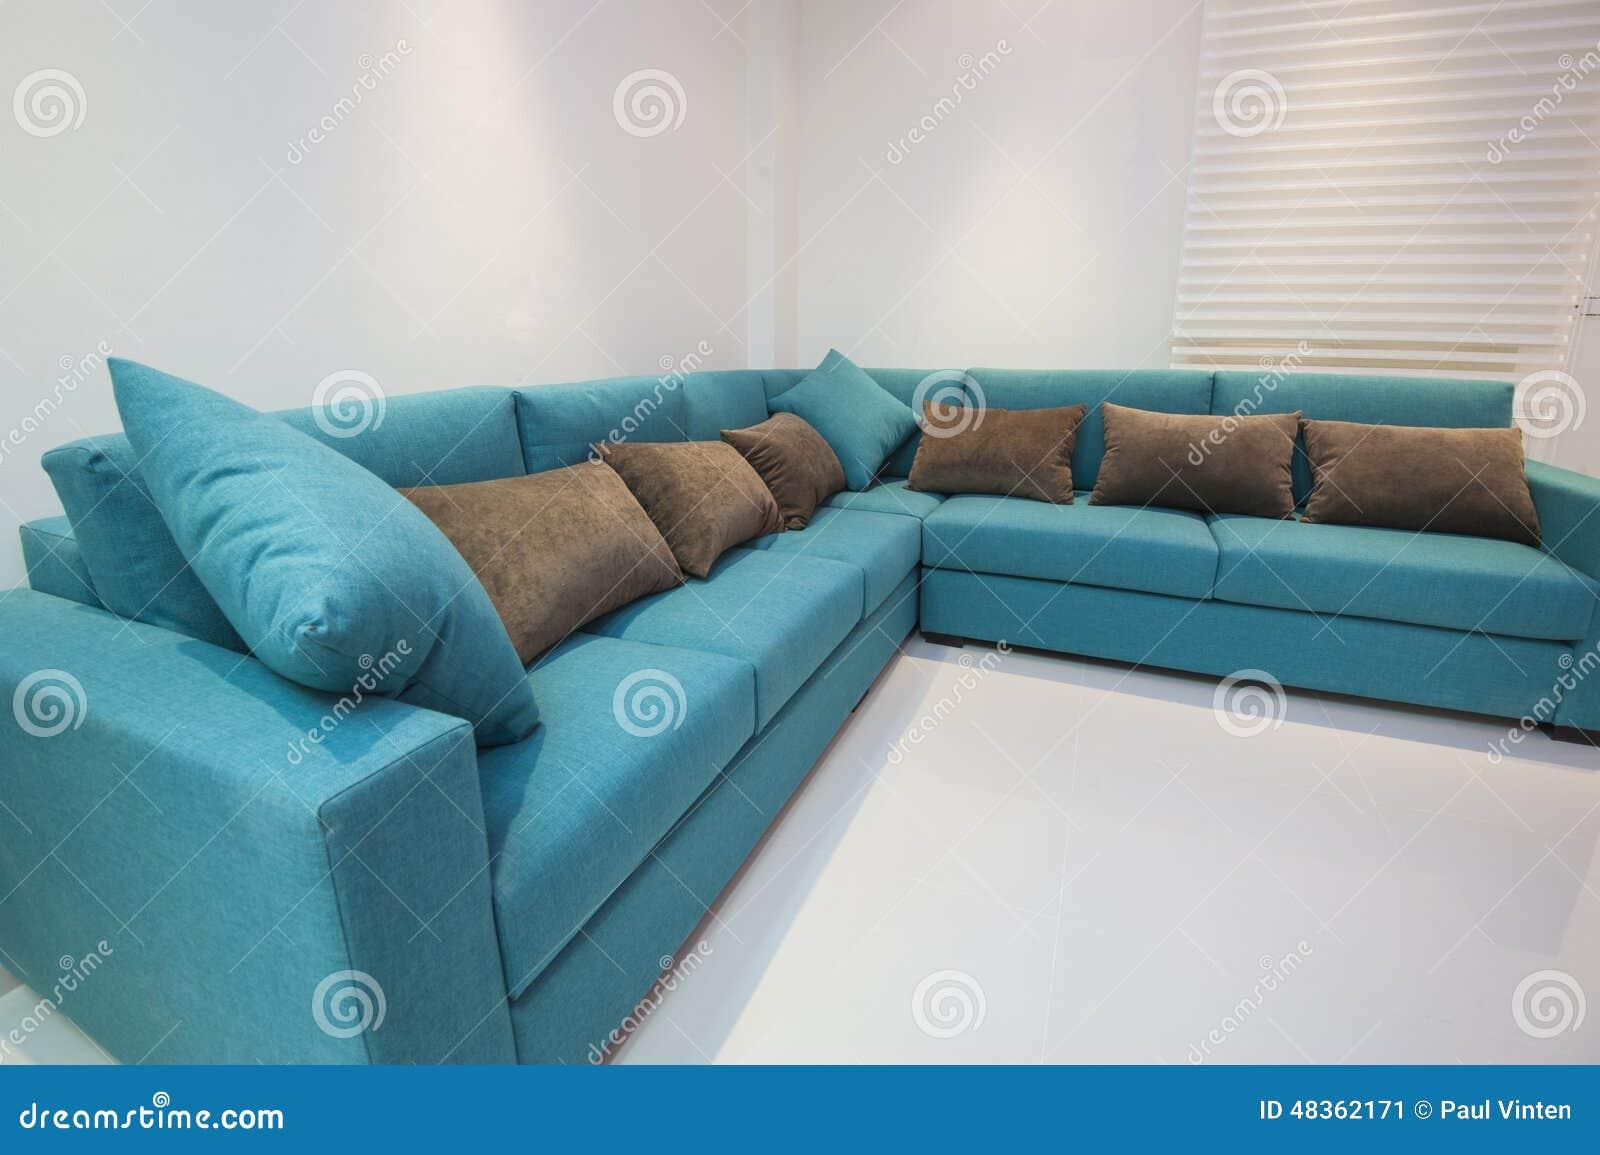 Sofa In Luxury Apartment Stock Photo Image 48362171